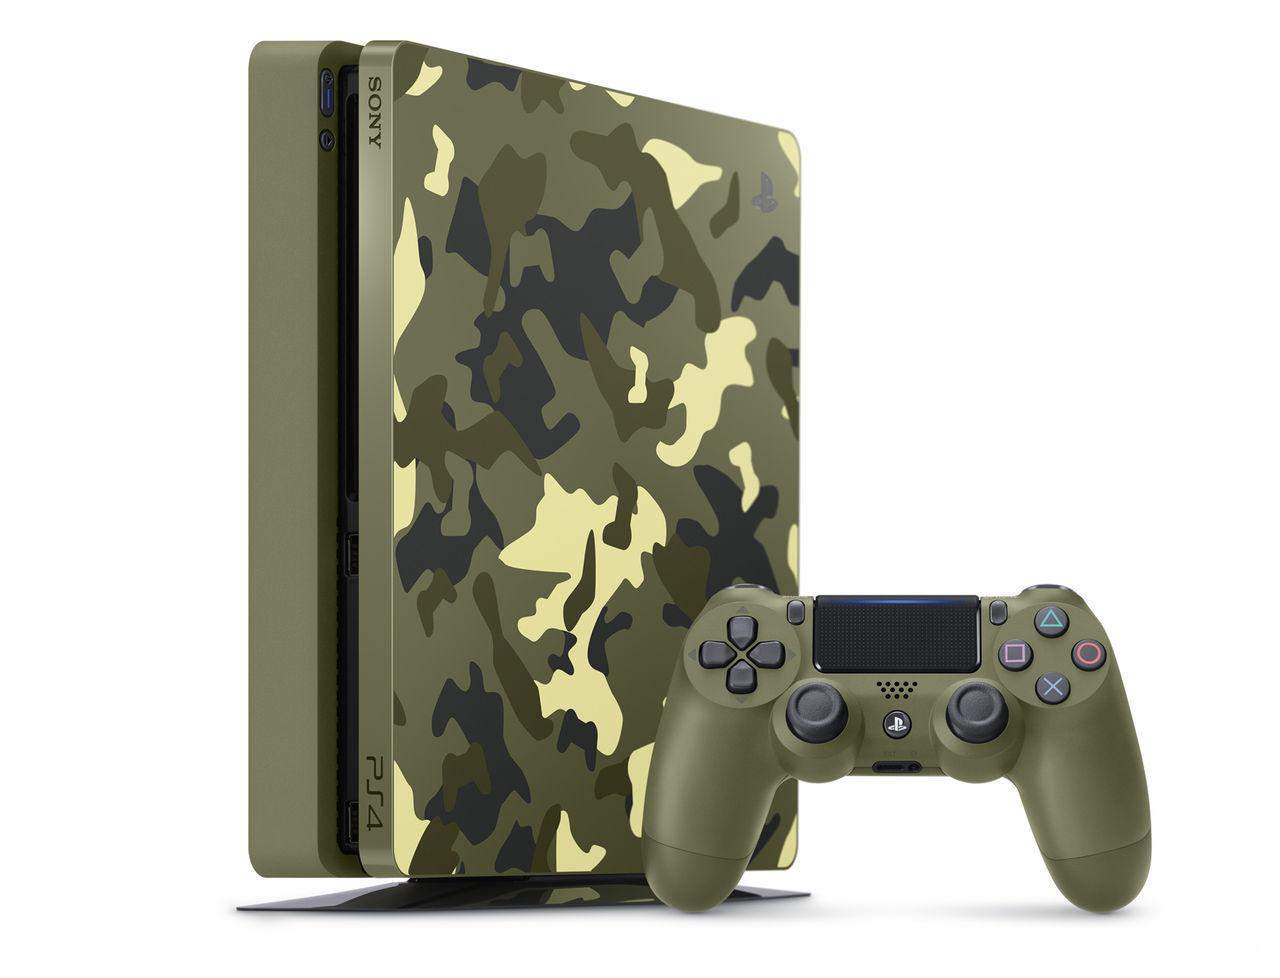 chequea-la-edicion-limitada-call-of-duty-wwii-playstation-4-frikigamers.com